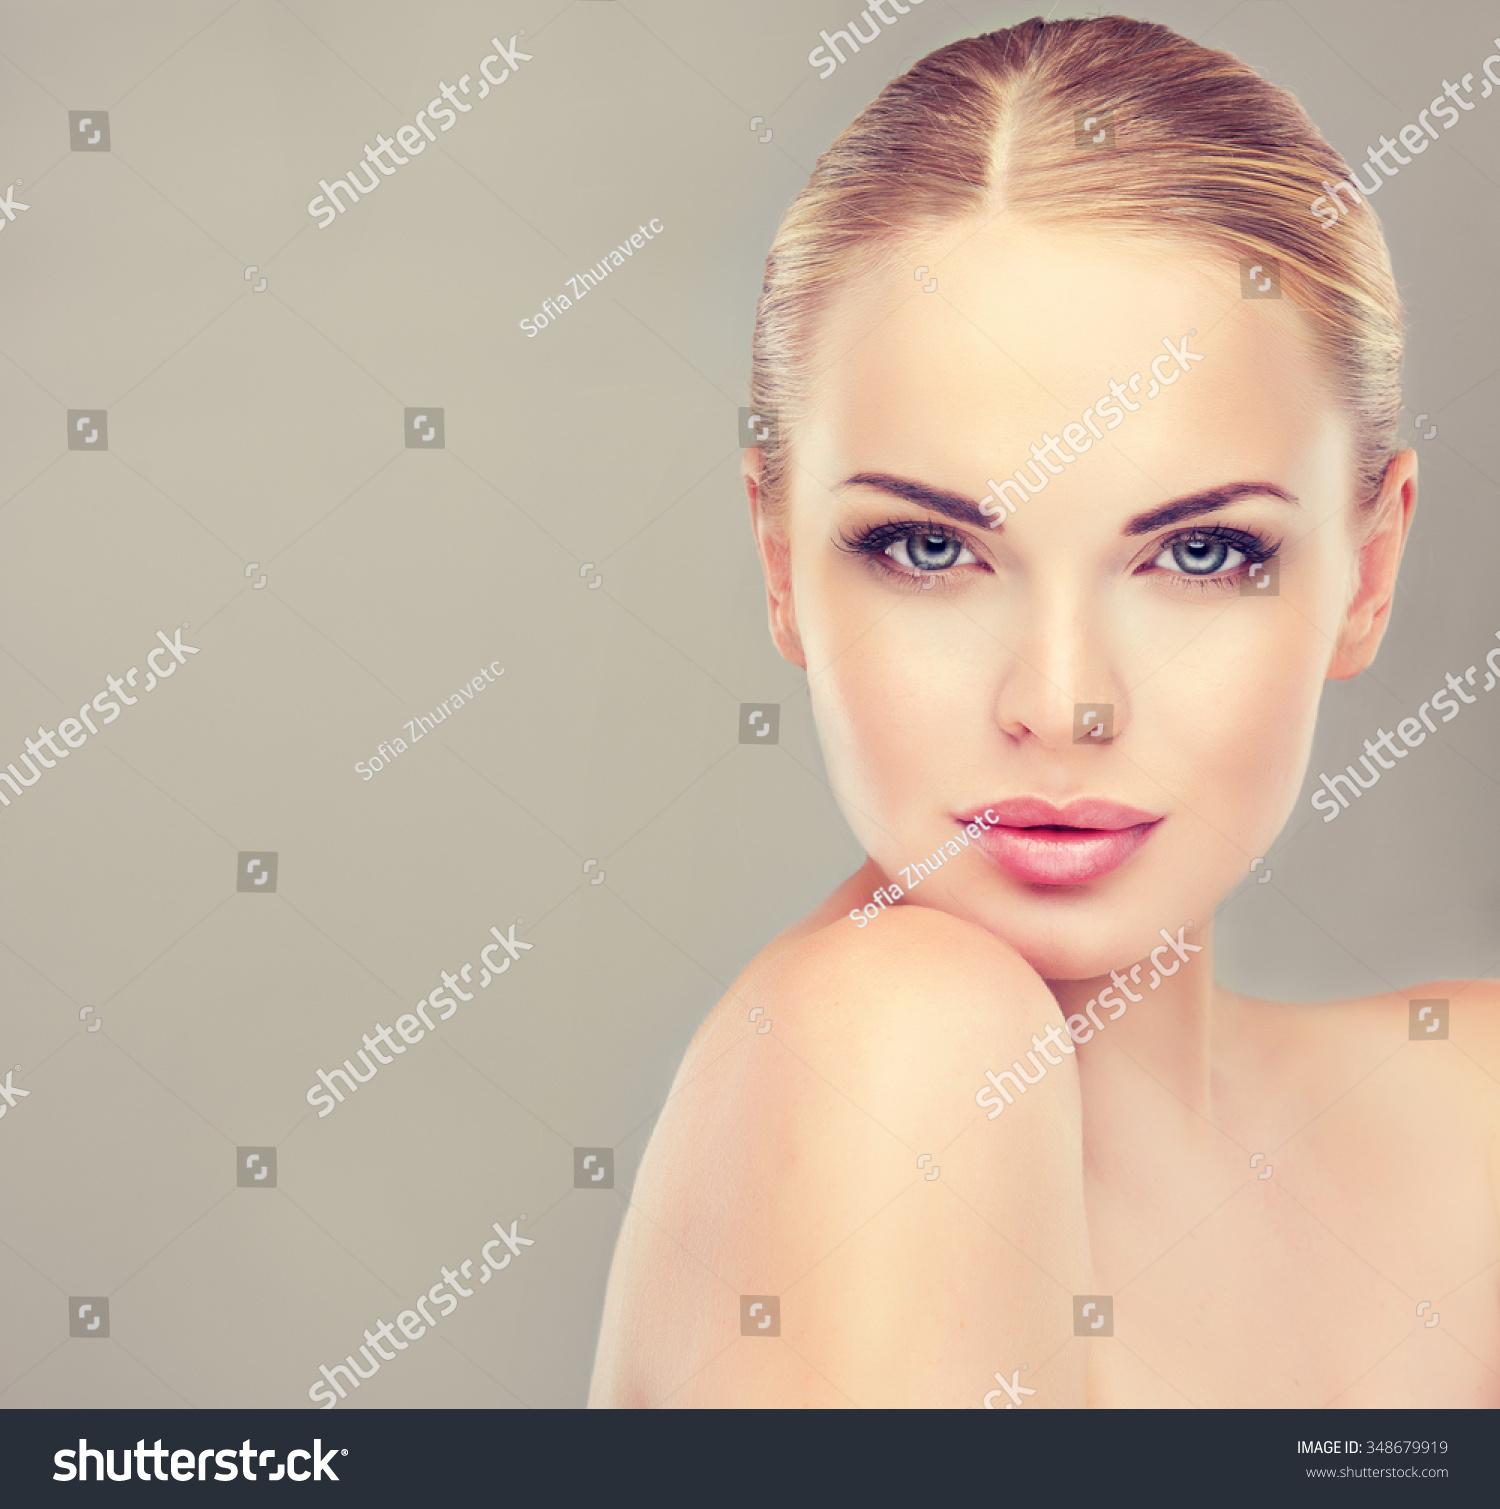 Woman Skin Care: Beautiful Woman Clean Fresh Skin Close Stock Photo